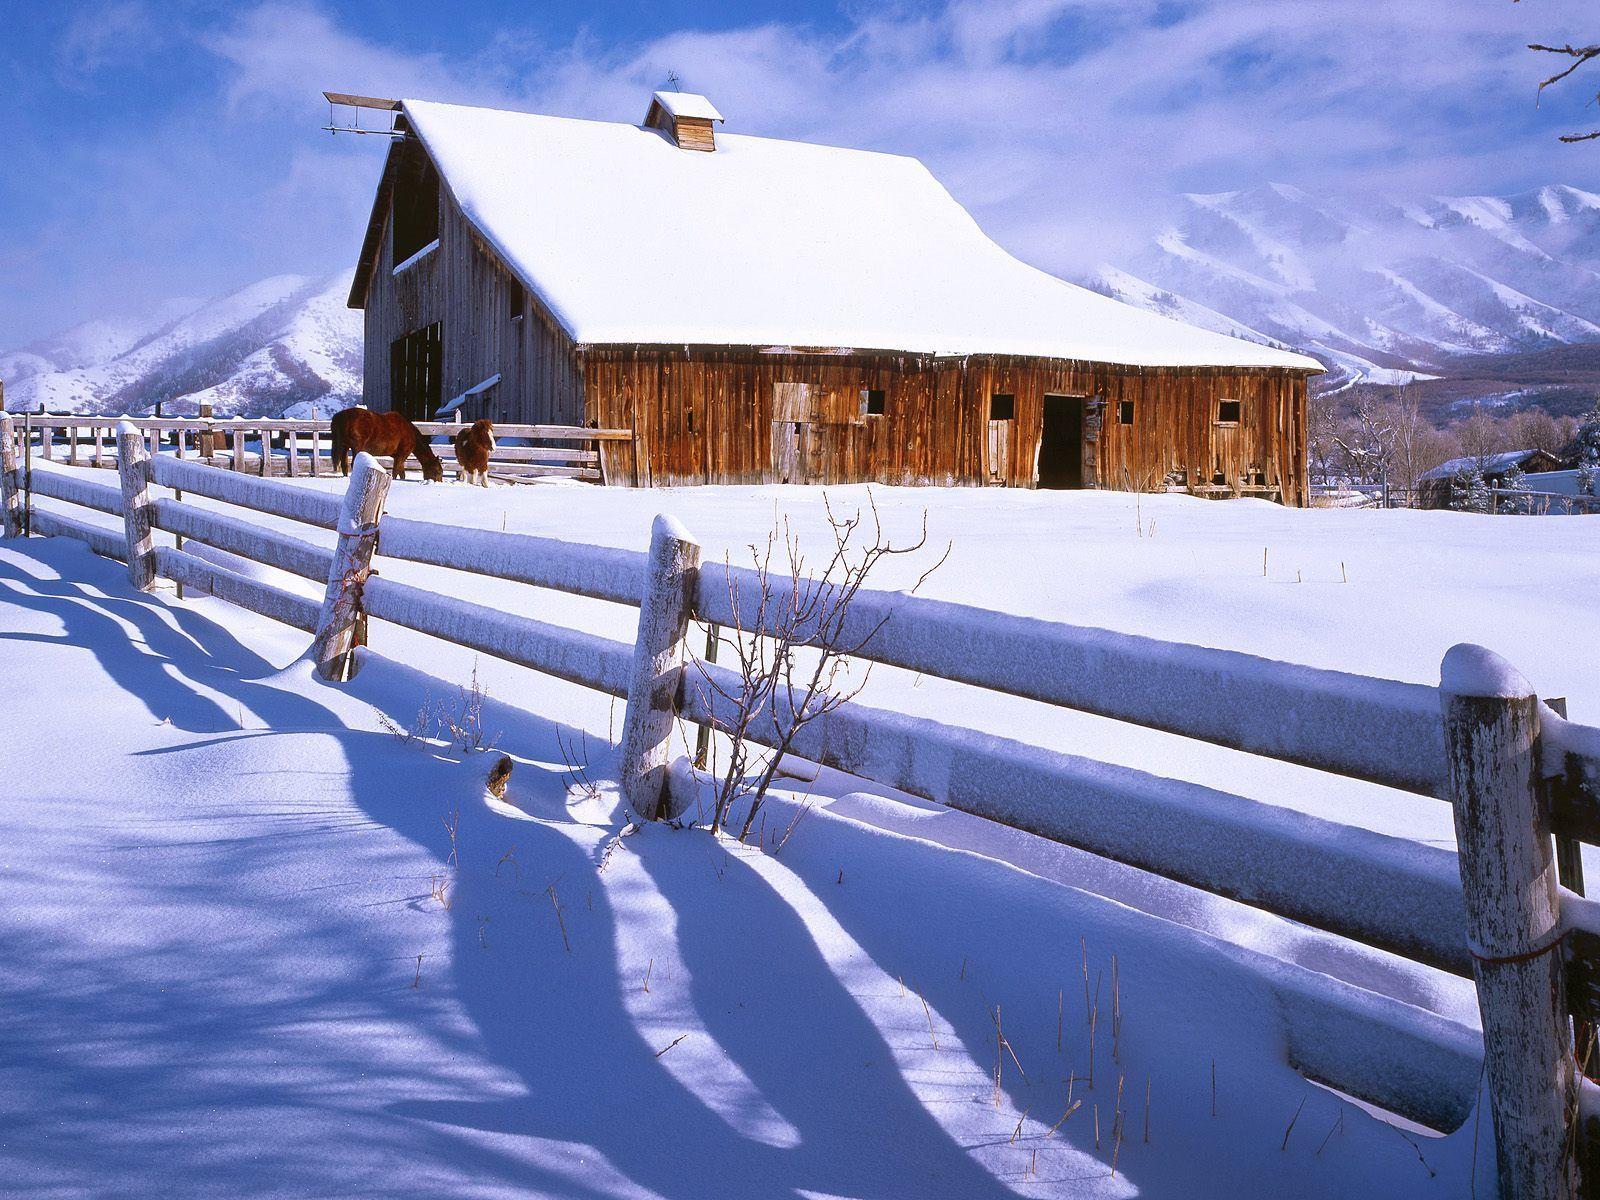 old cabin winter scene wallpaper - photo #24